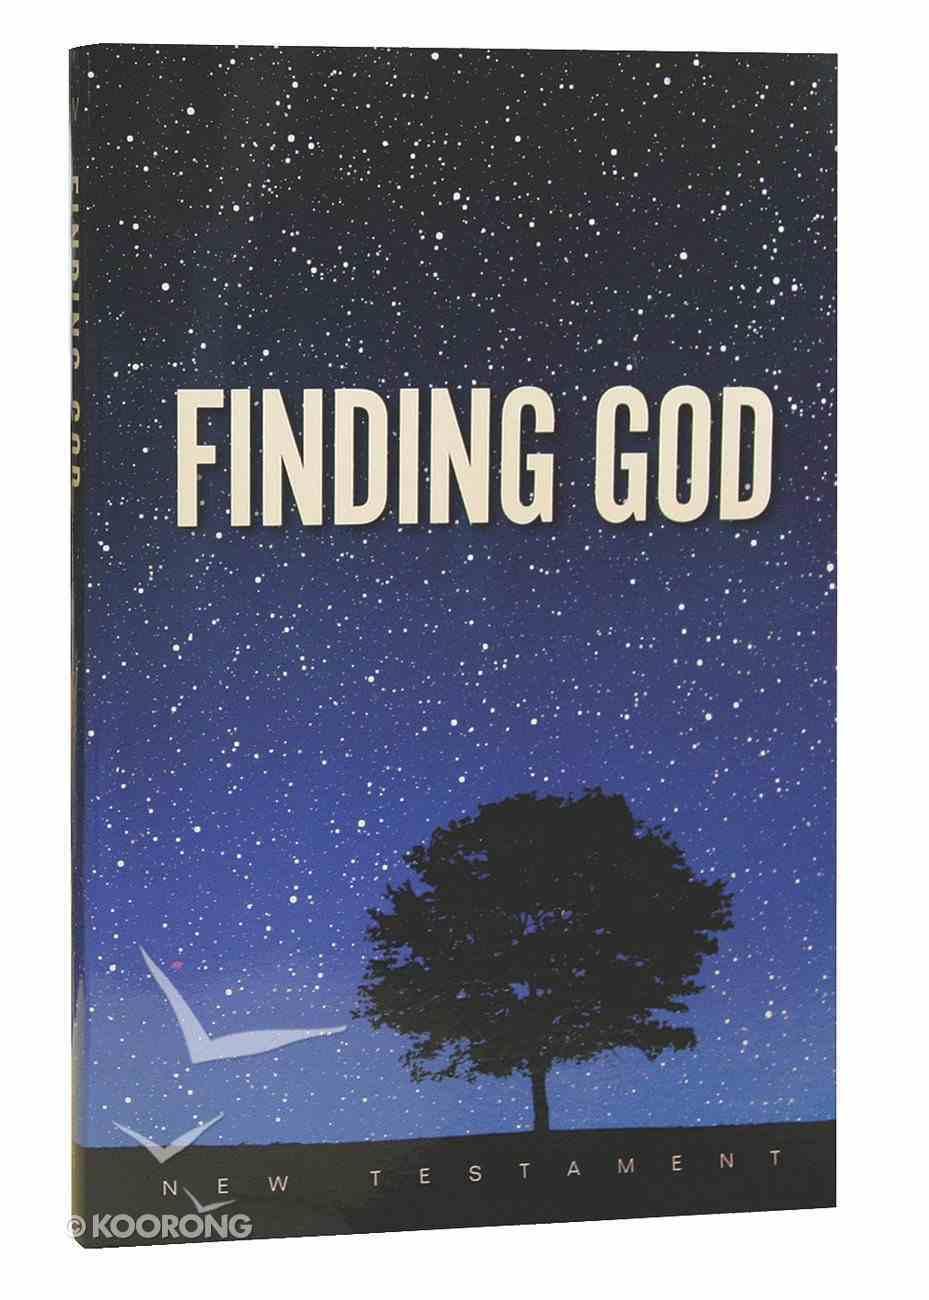 NIV Finding God New Testament: Stars Paperback